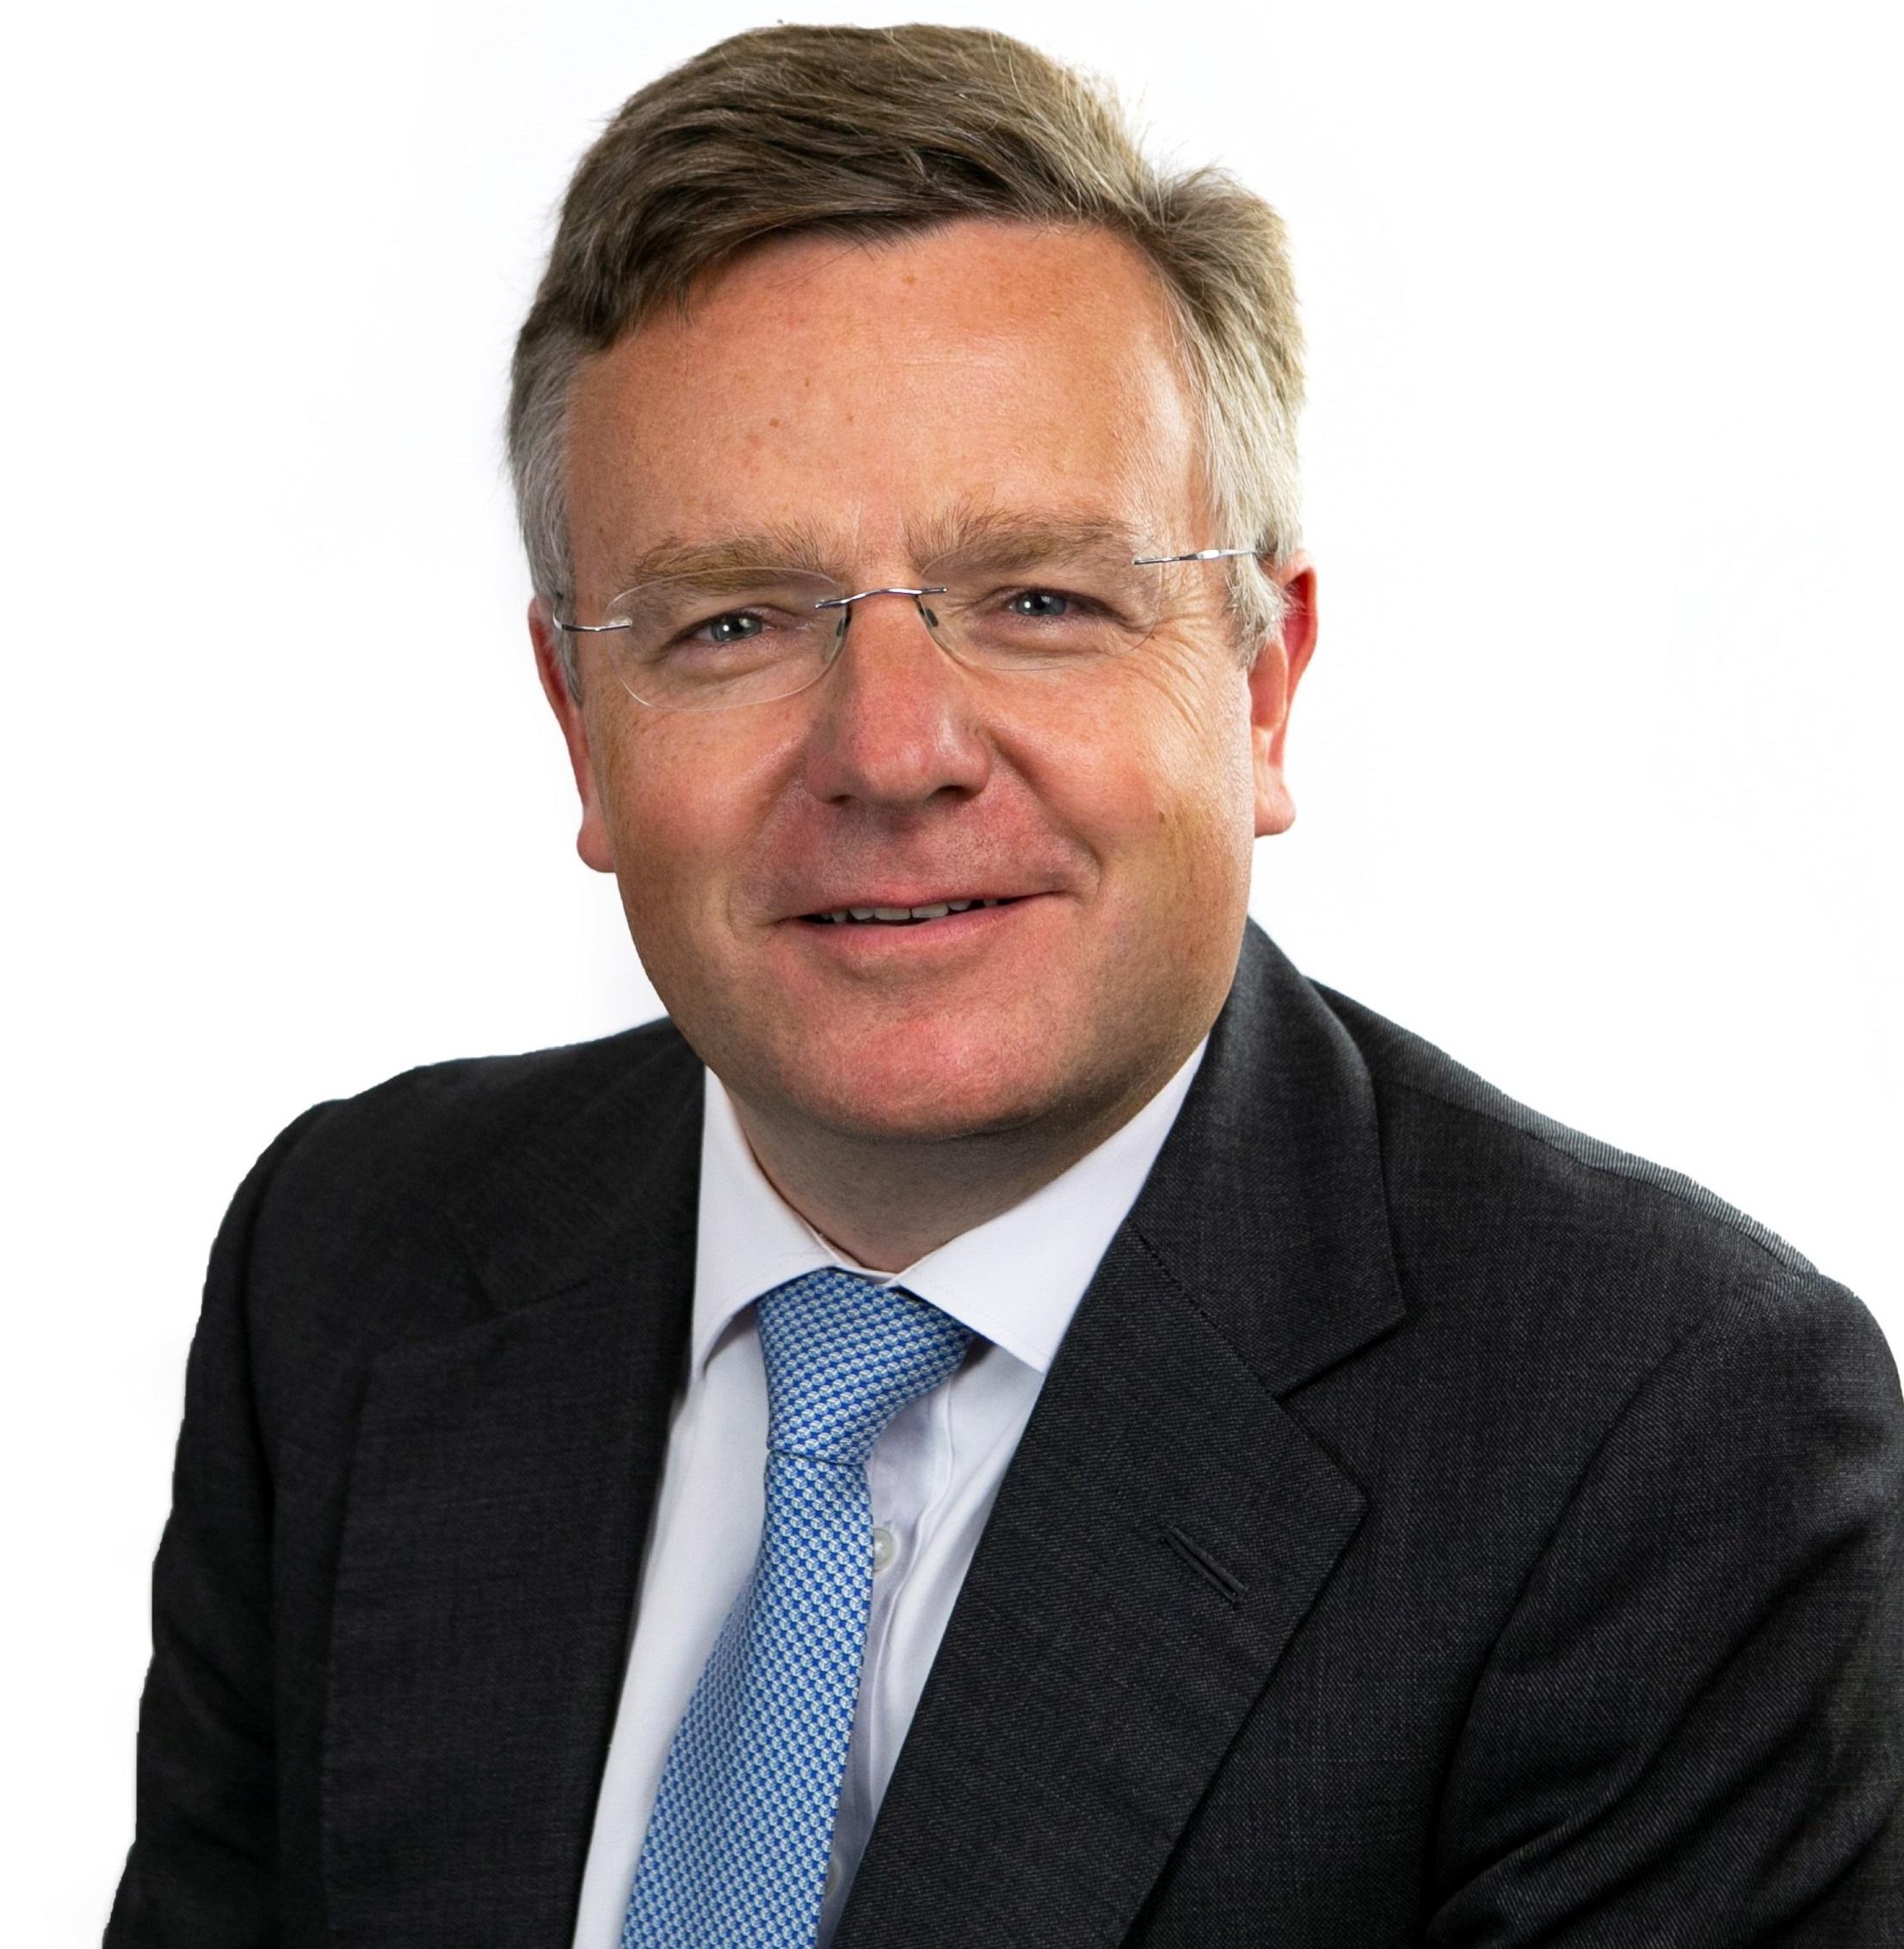 Michael Findlay, LSEG